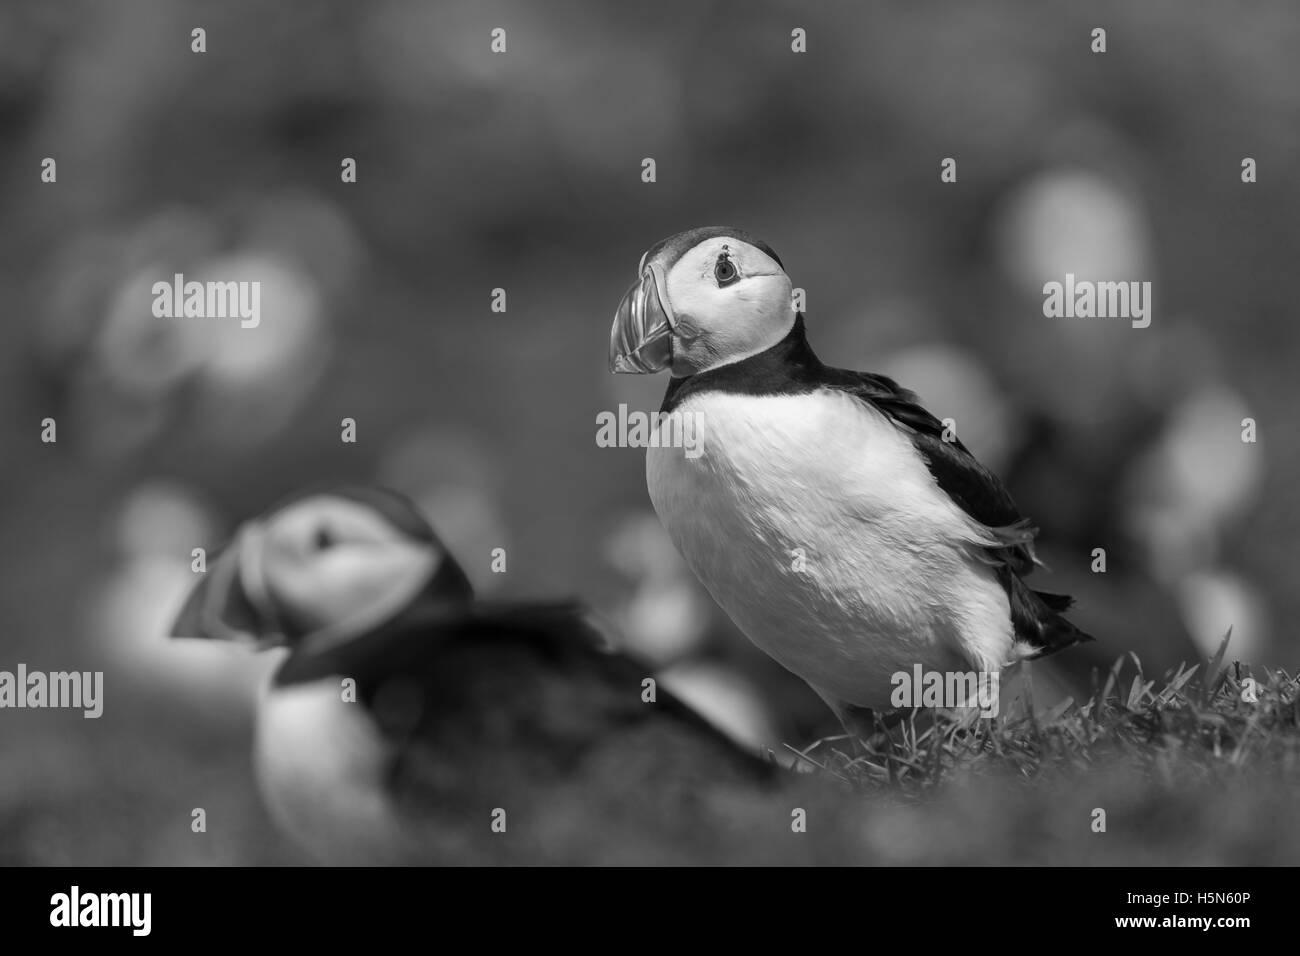 Puffins in grass on Treshnish Isles, Scotland - Stock Image